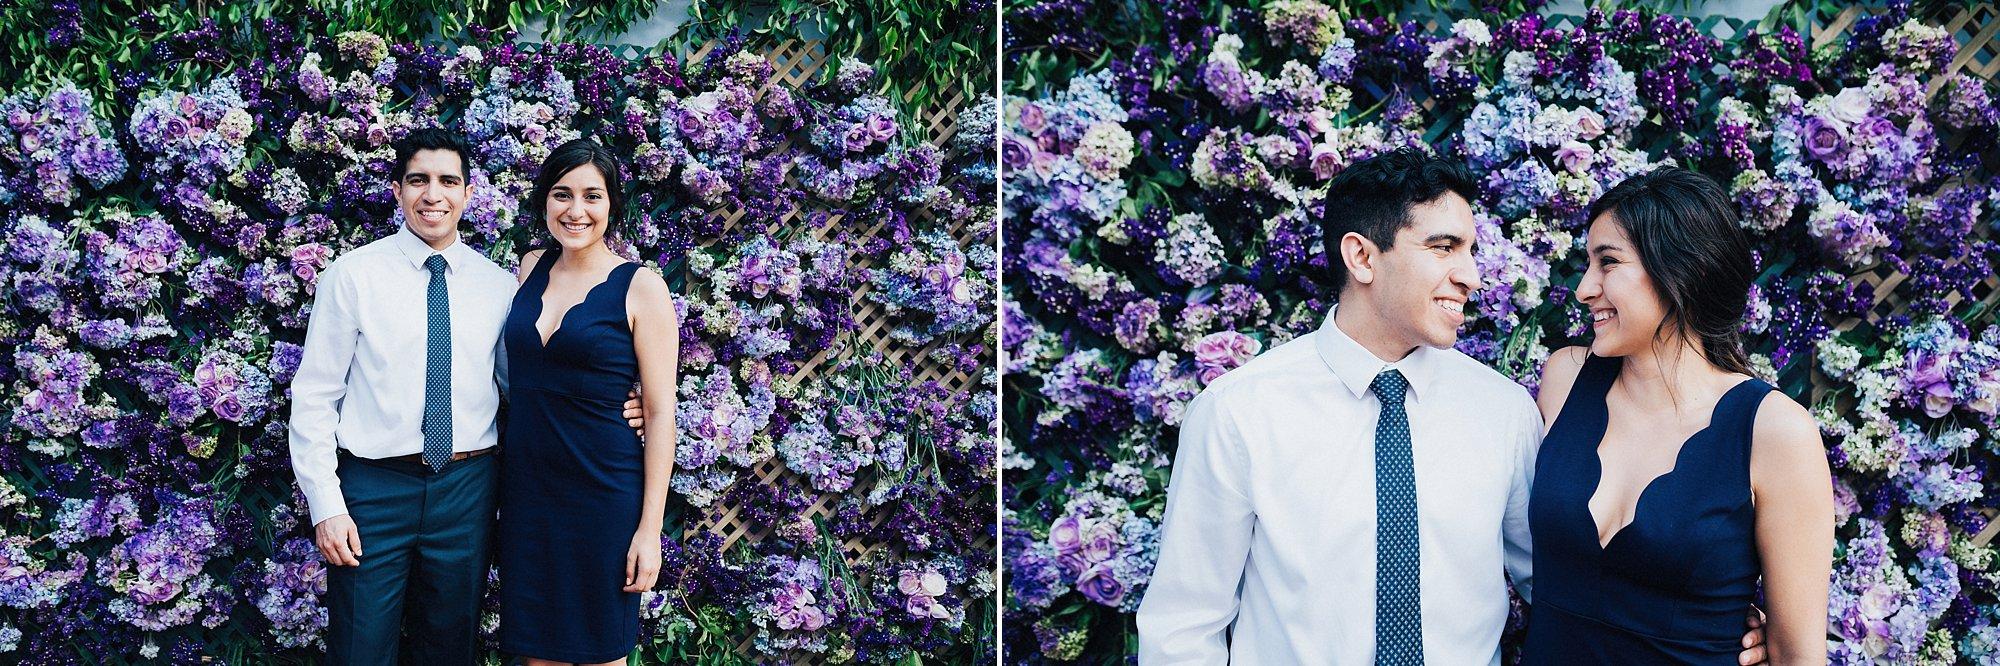 alex-yazmin-wedding-photographer-antigua-guatemala-114